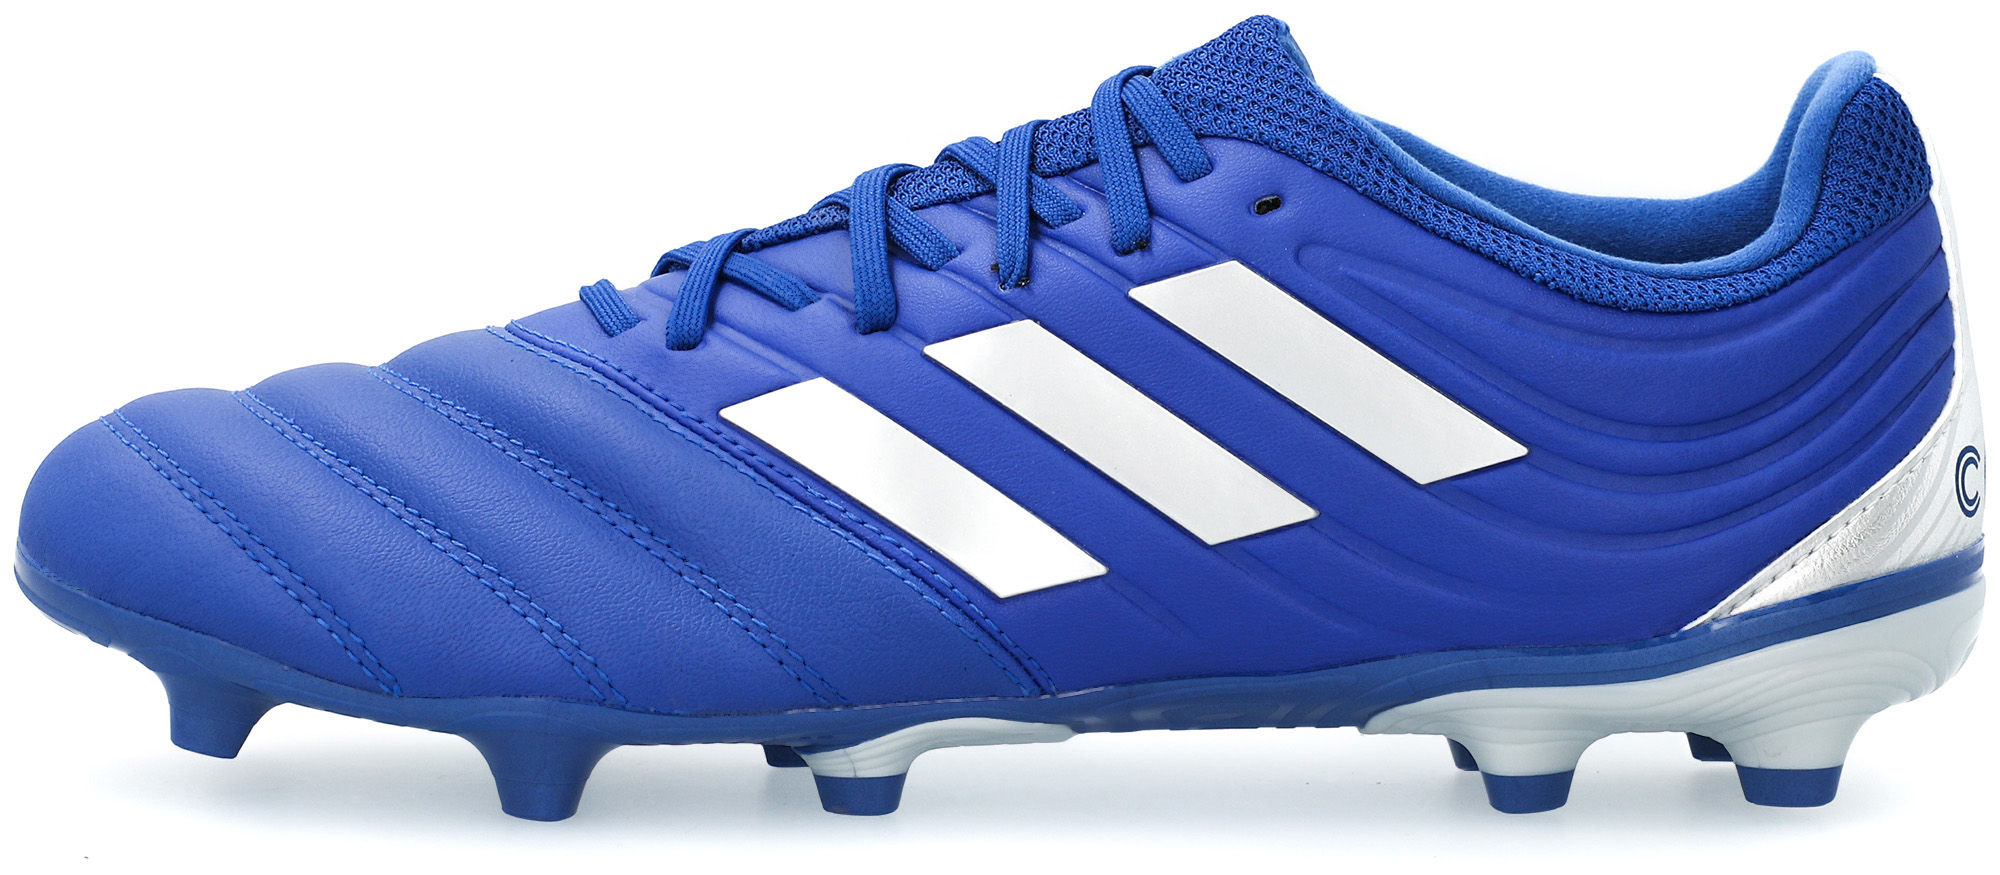 Бутсы мужские adidas Copa 20.3 Fg, размер 41 adidas бутсы для мальчиков adidas copa 20 3 fg j размер 37